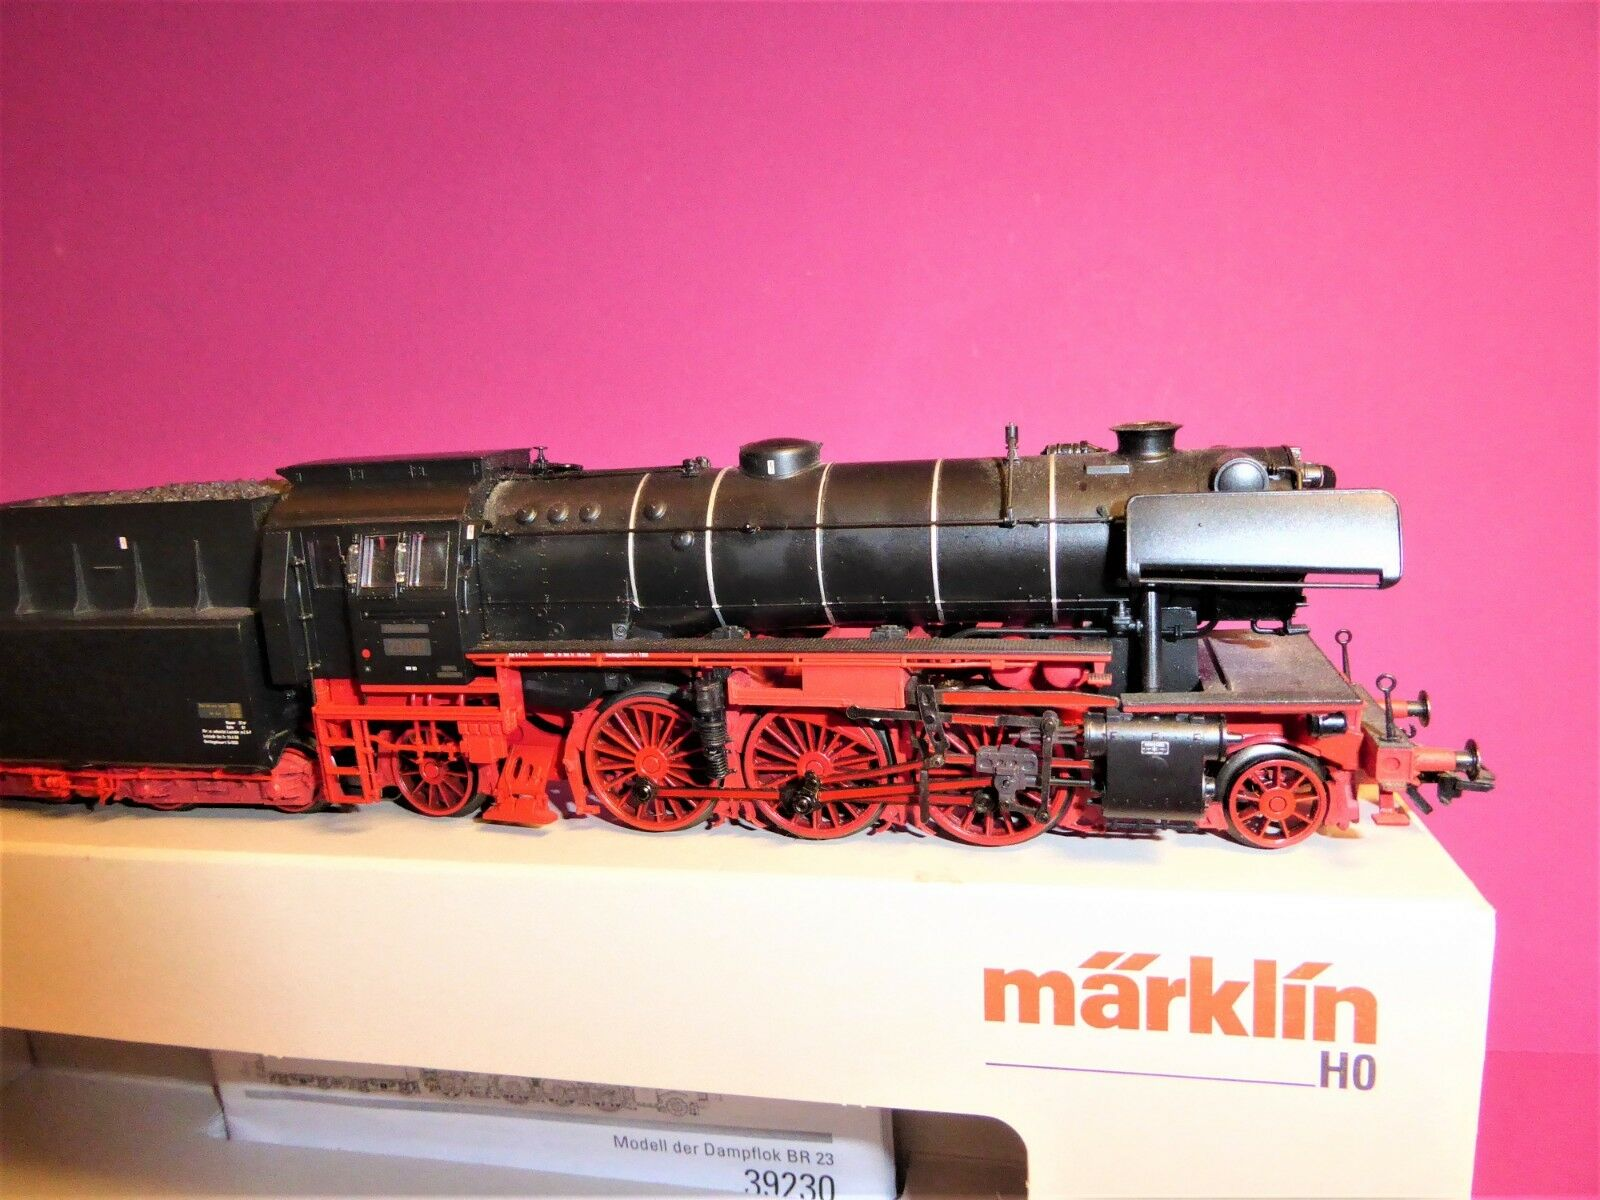 Märklin h0 39230 mfx-digital Sound br23 001 DB con humo